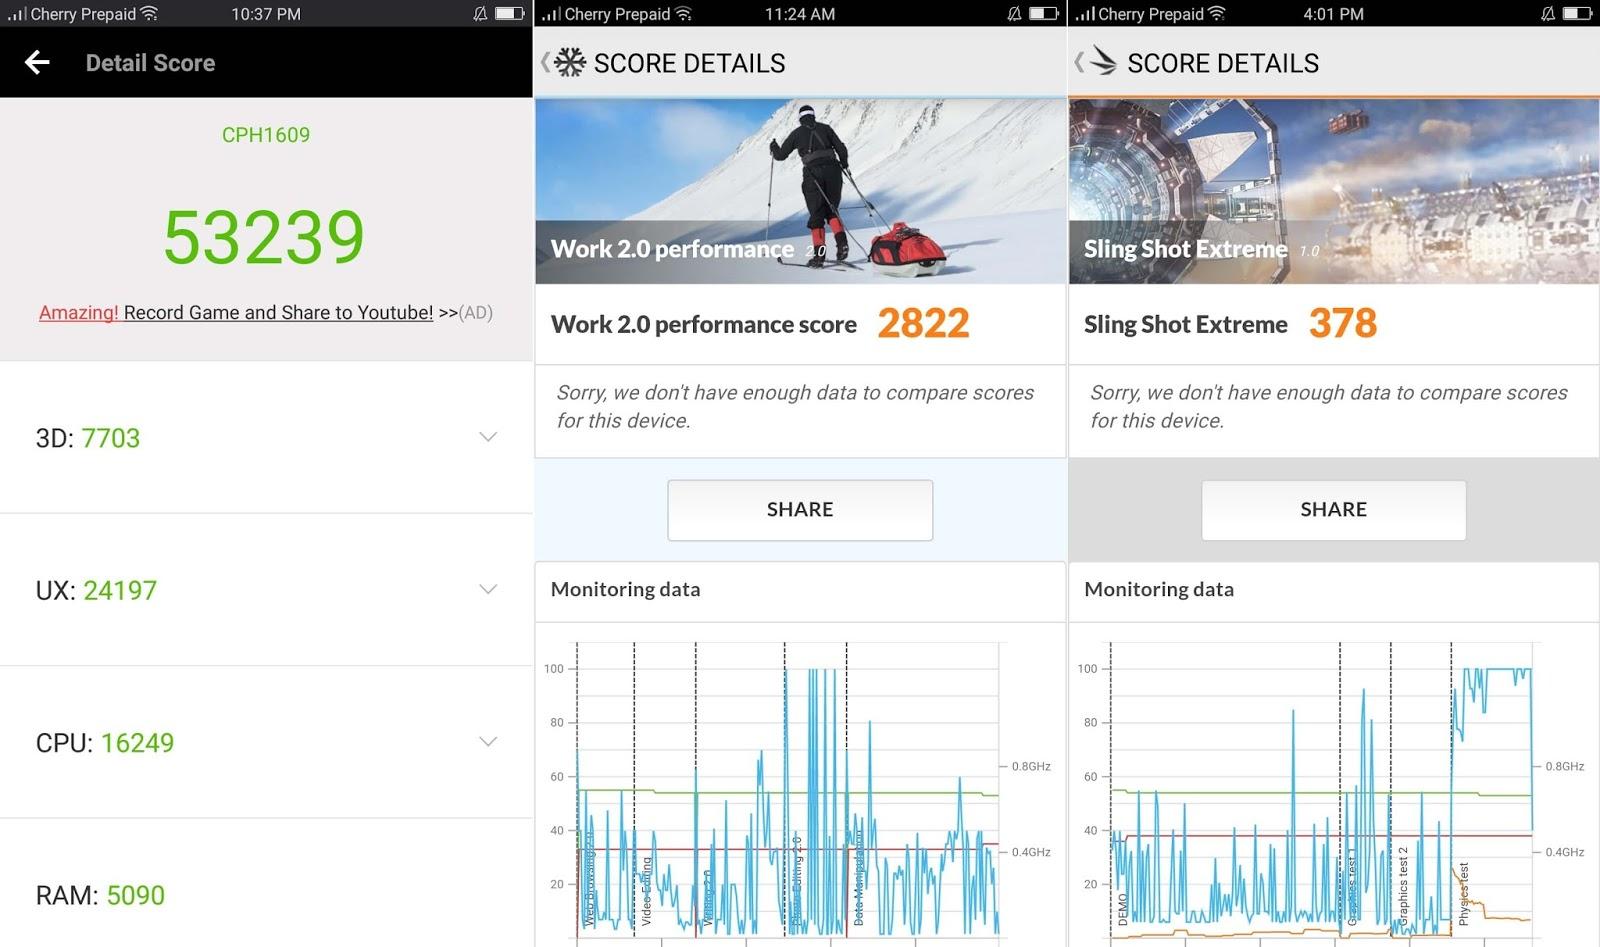 OPPO F3 Benchmark Scores